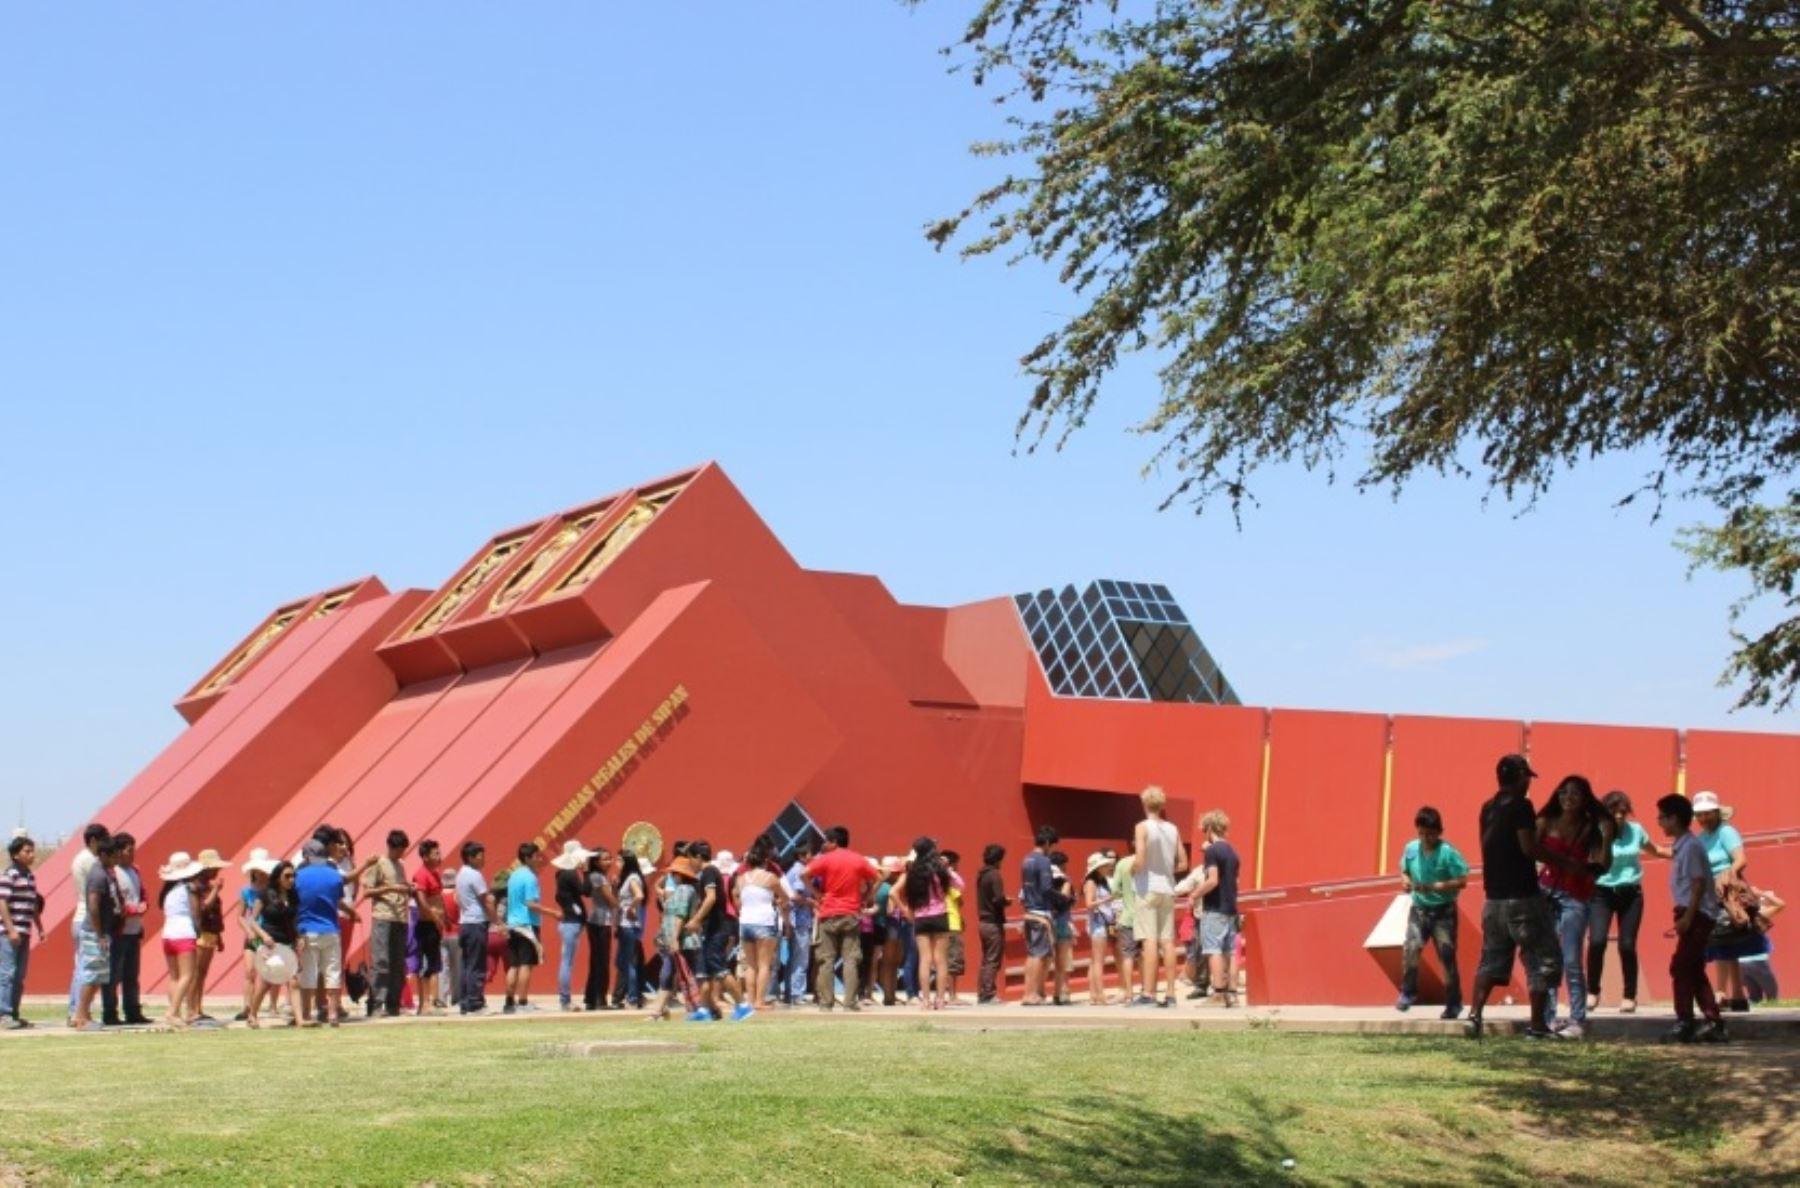 Hoy habrá ingreso libre al Museo Tumbas Reales de Sipán, en Lambayeque. ANDINA/Difusión